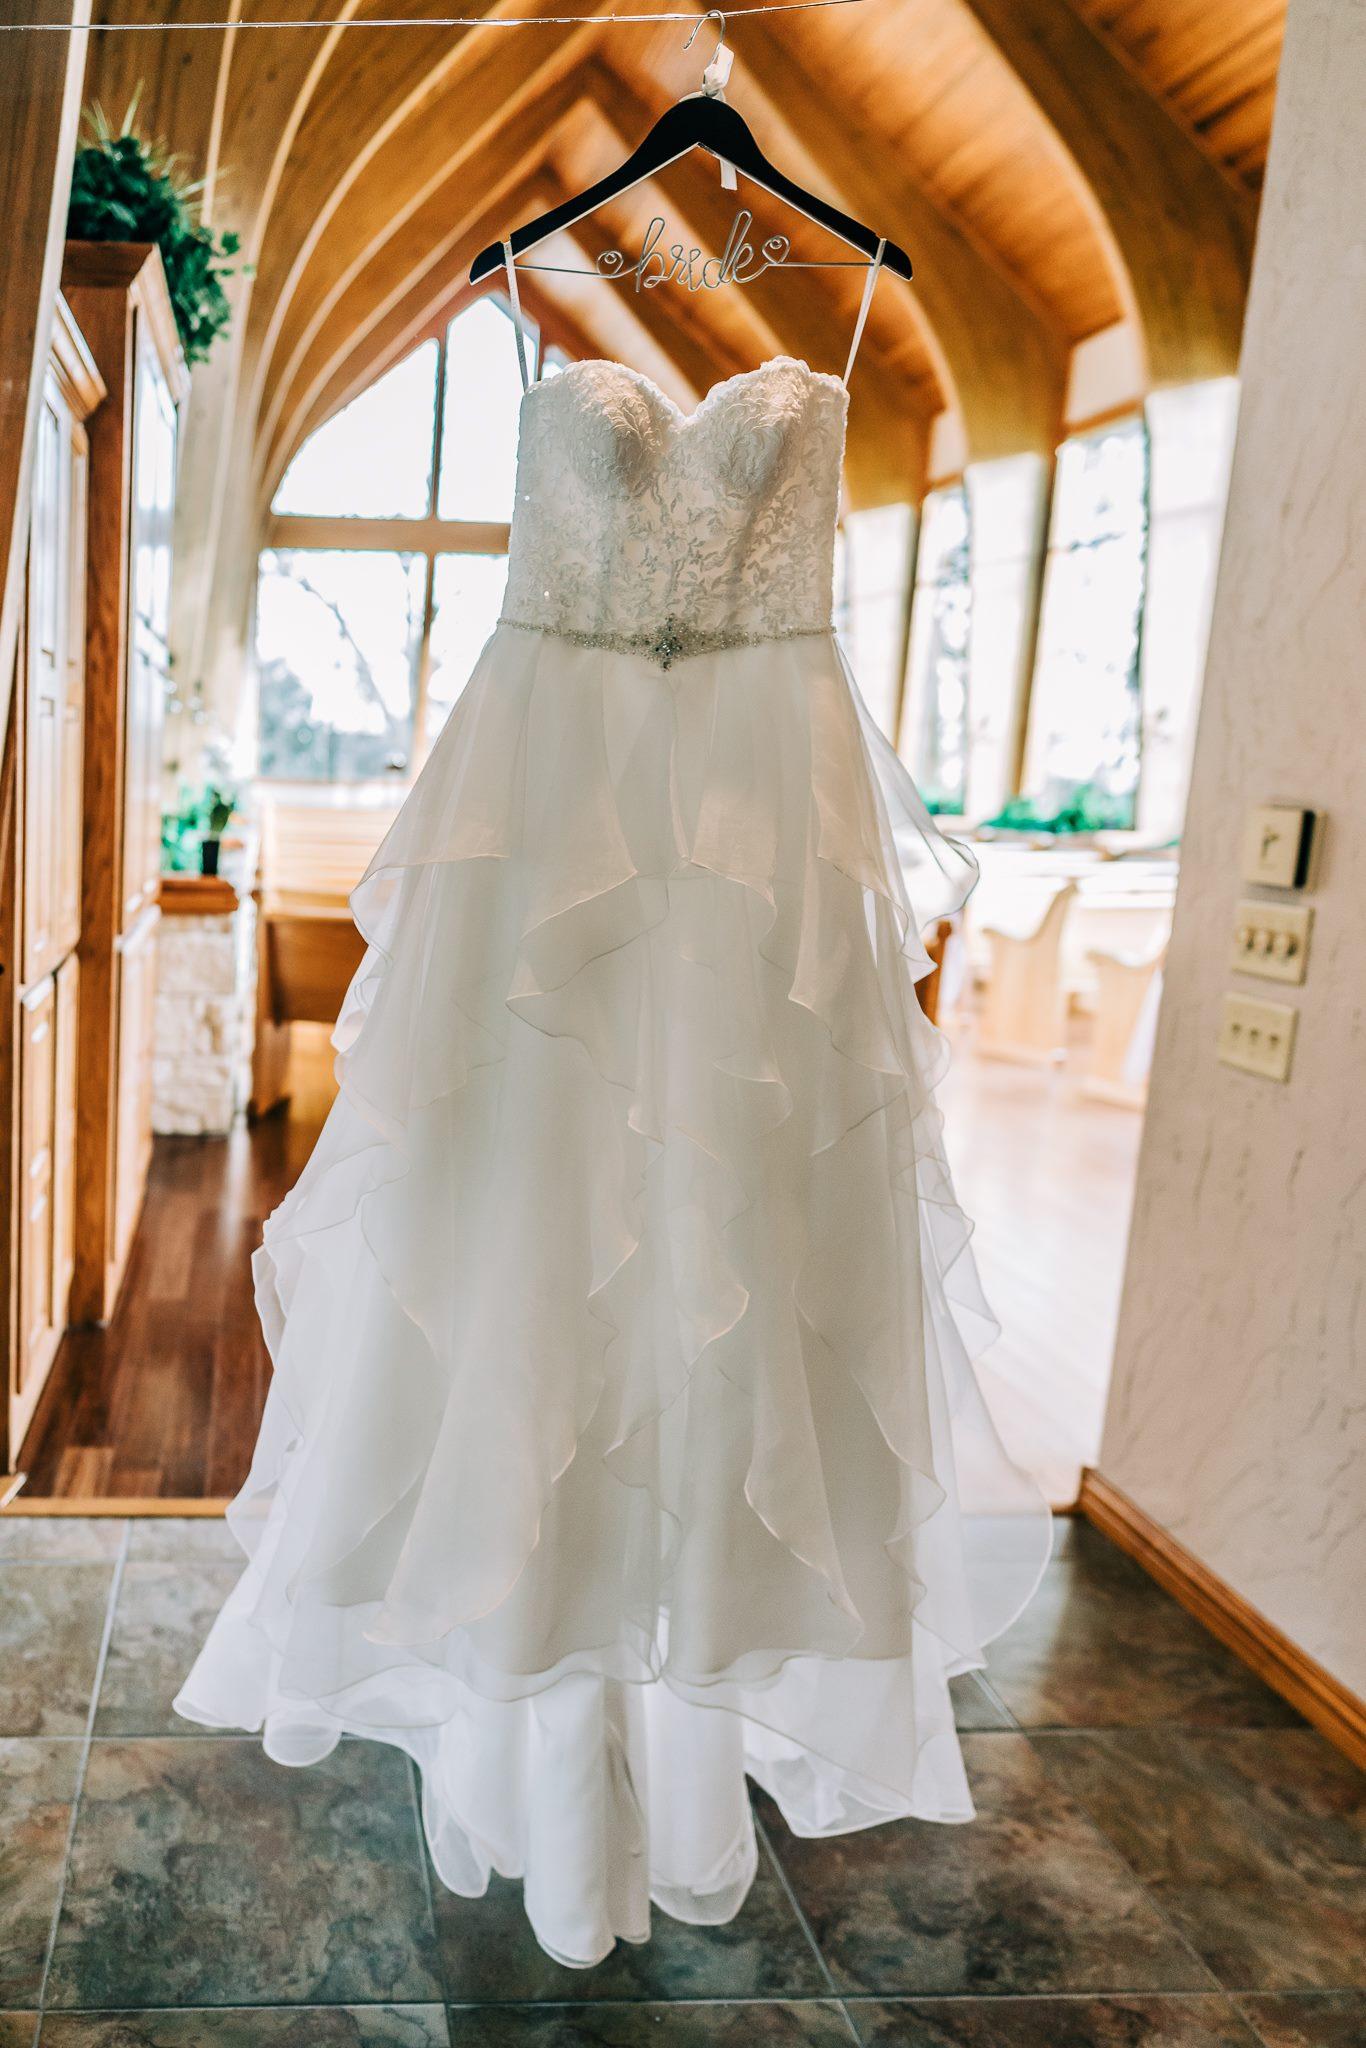 Aubrey-Texas-Harmony-Chapel-Wedding-Florist-David-Co.-9.jpg